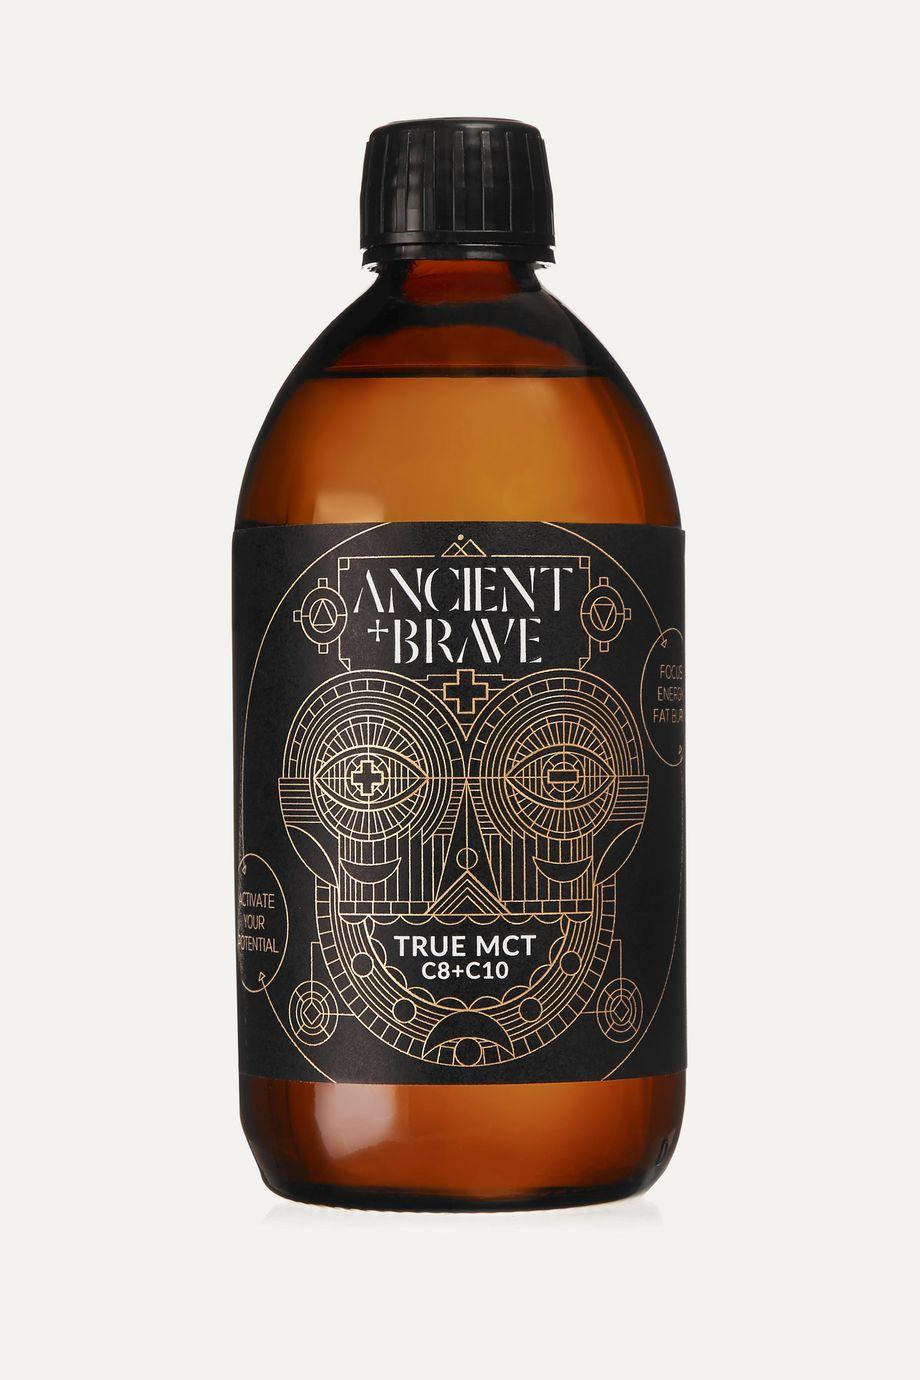 ANCIENT+BRAVE True MCT Oil, 500ml